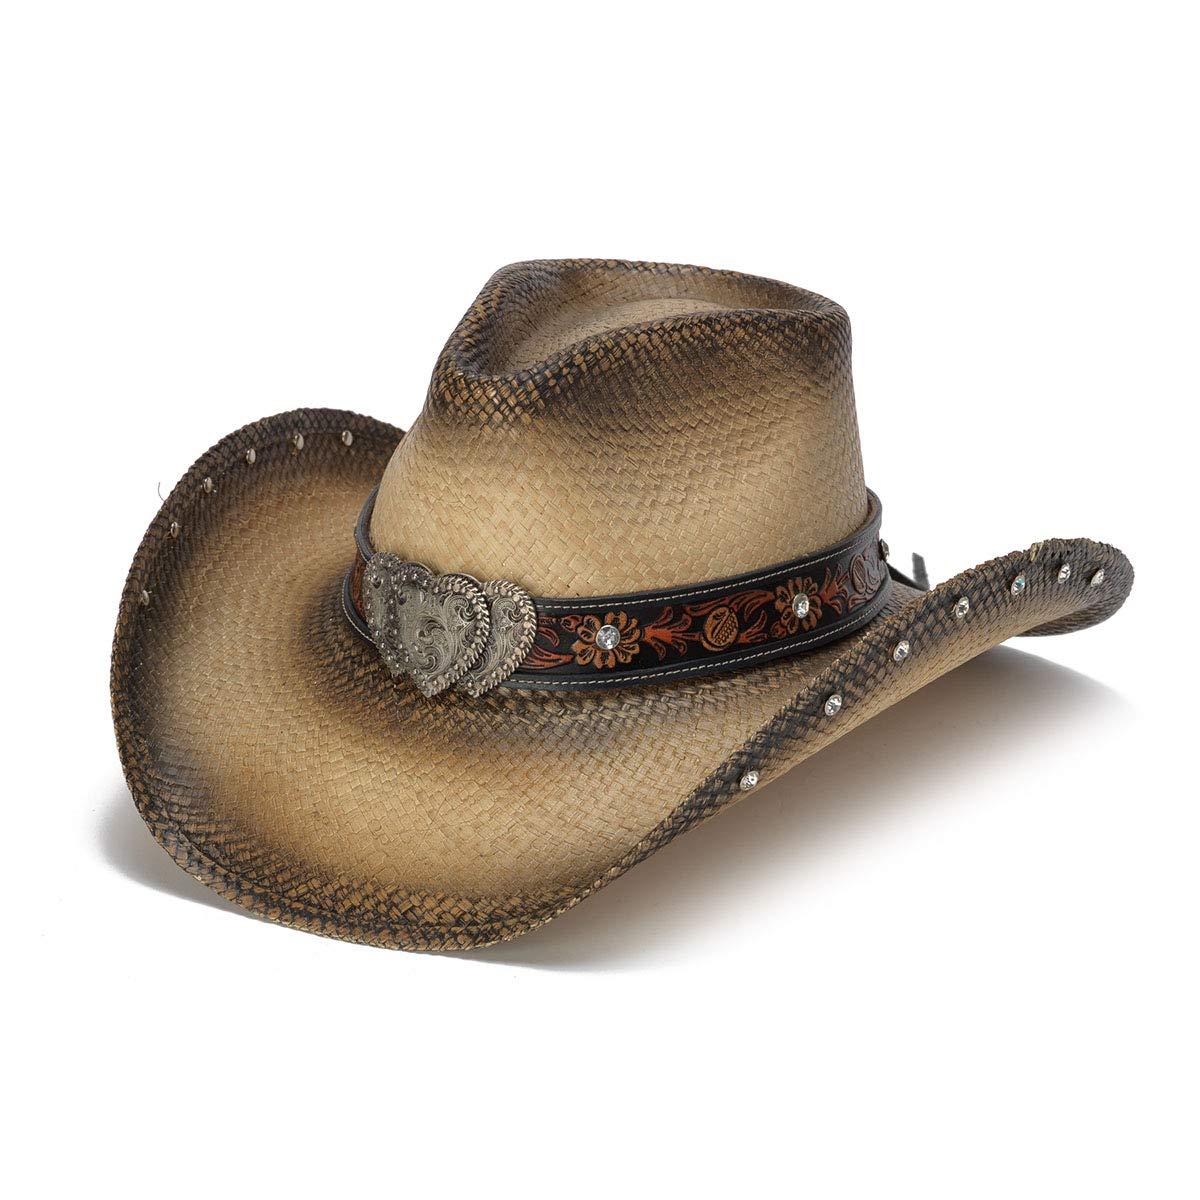 Stampede Hats Women's Sabrian Heart Rhinestone Western Hat S Tea Stain